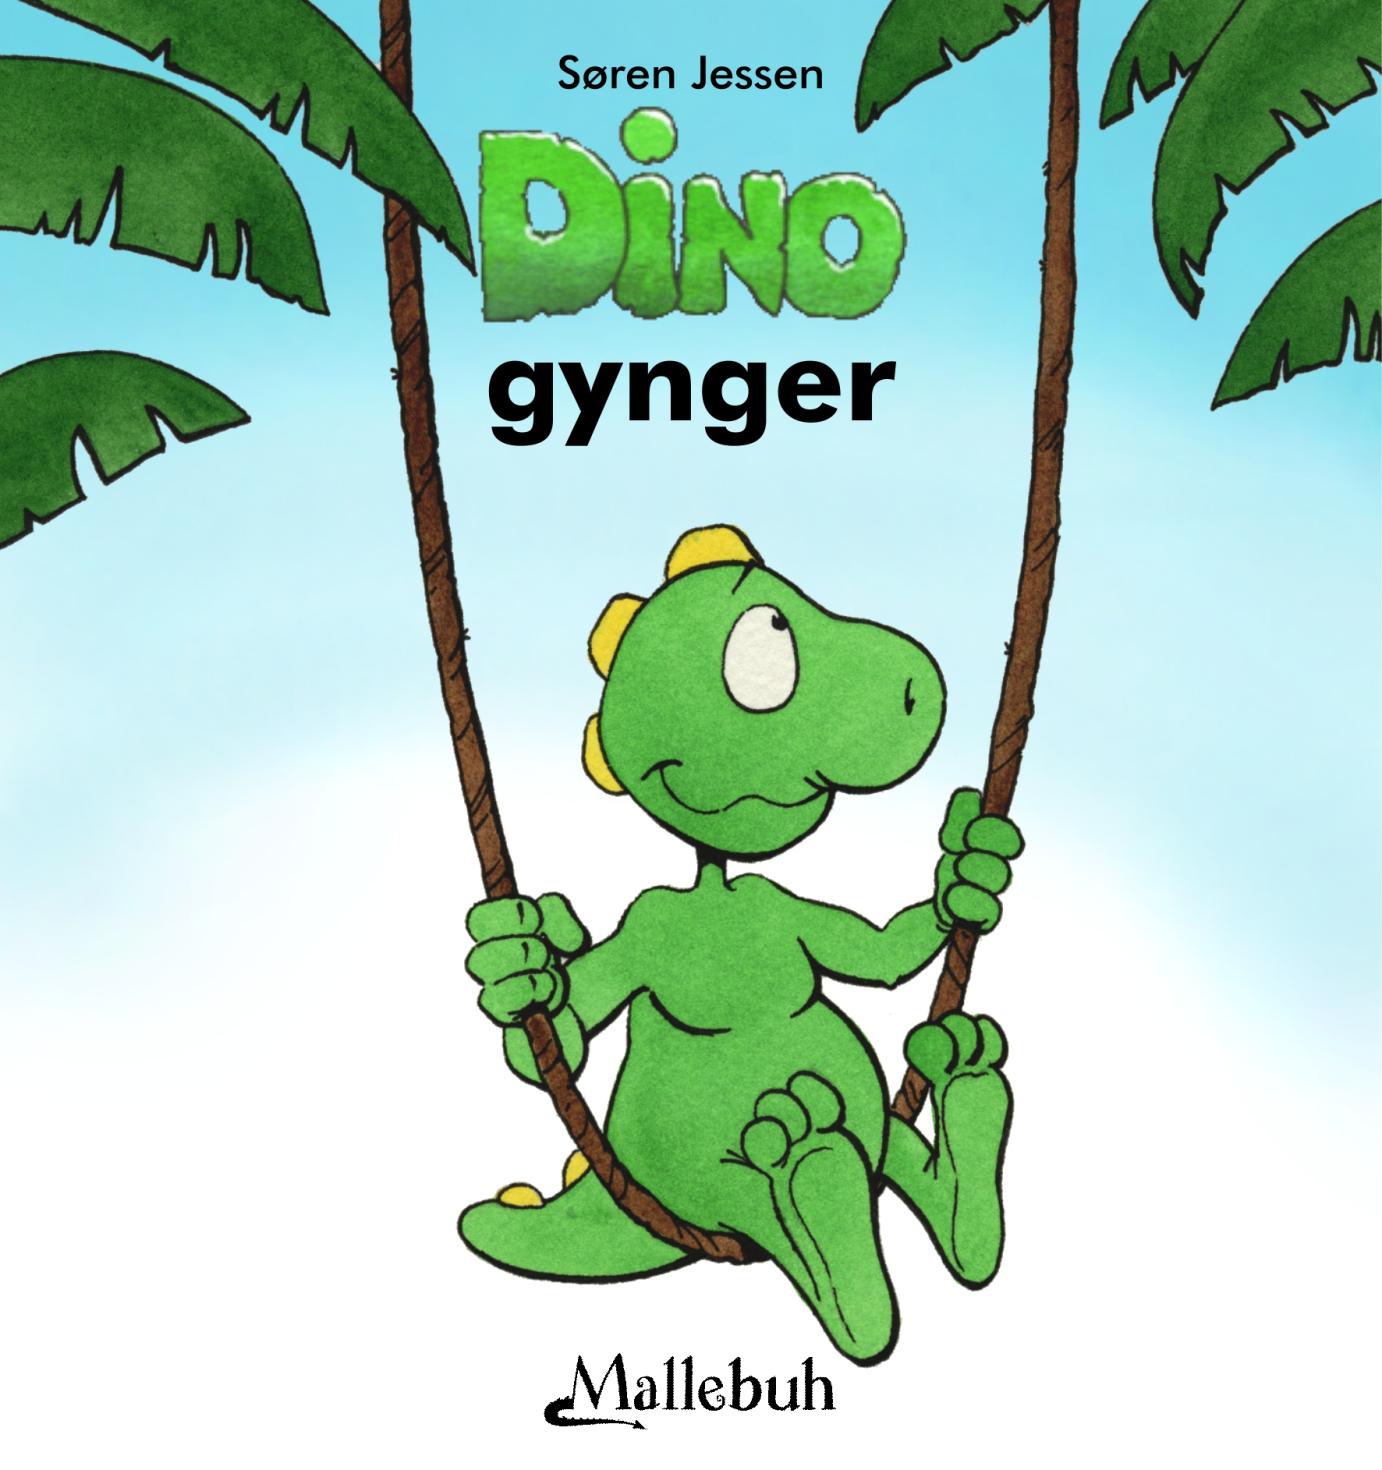 Dino gynger - Maneno